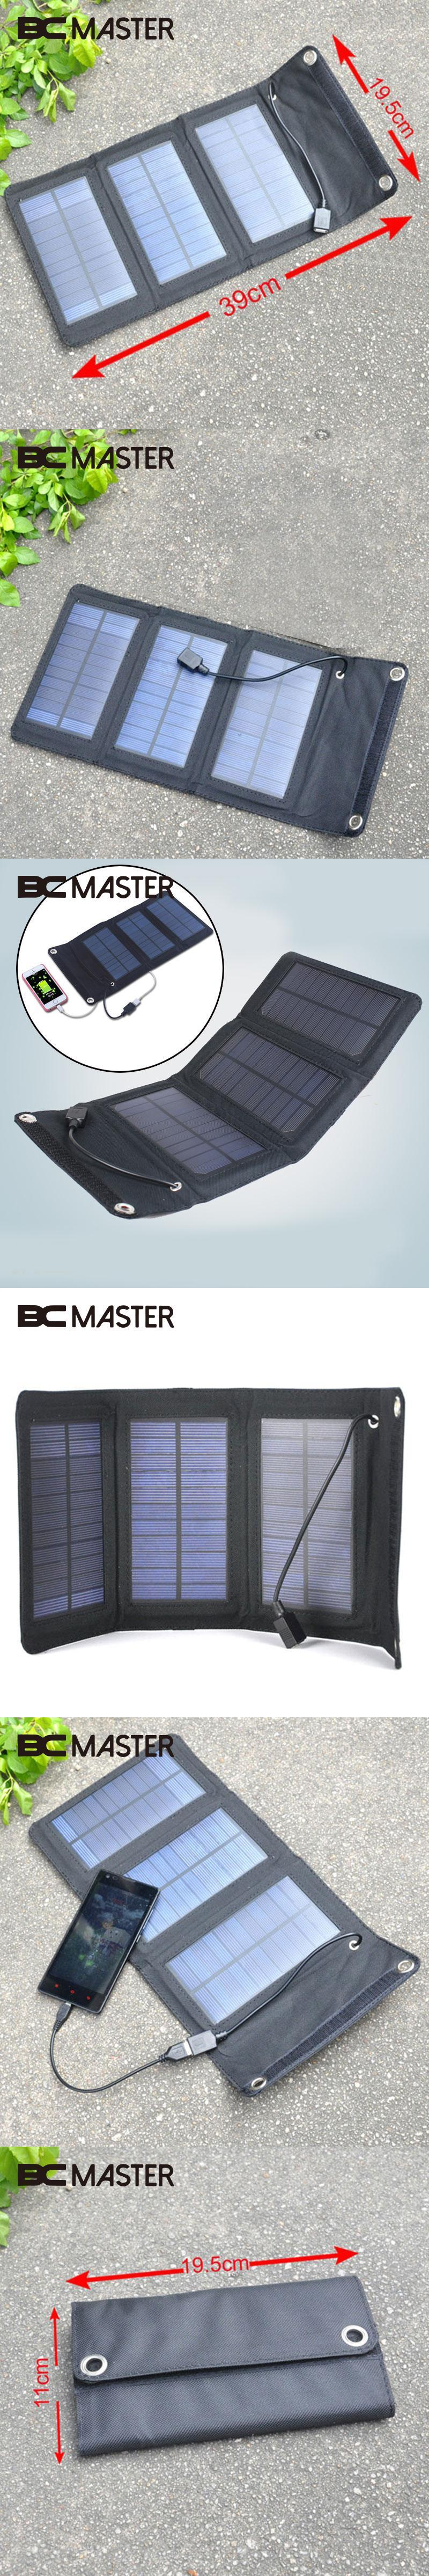 bcmaster 5w 5v foldable solar panel bank battery charger usb solar